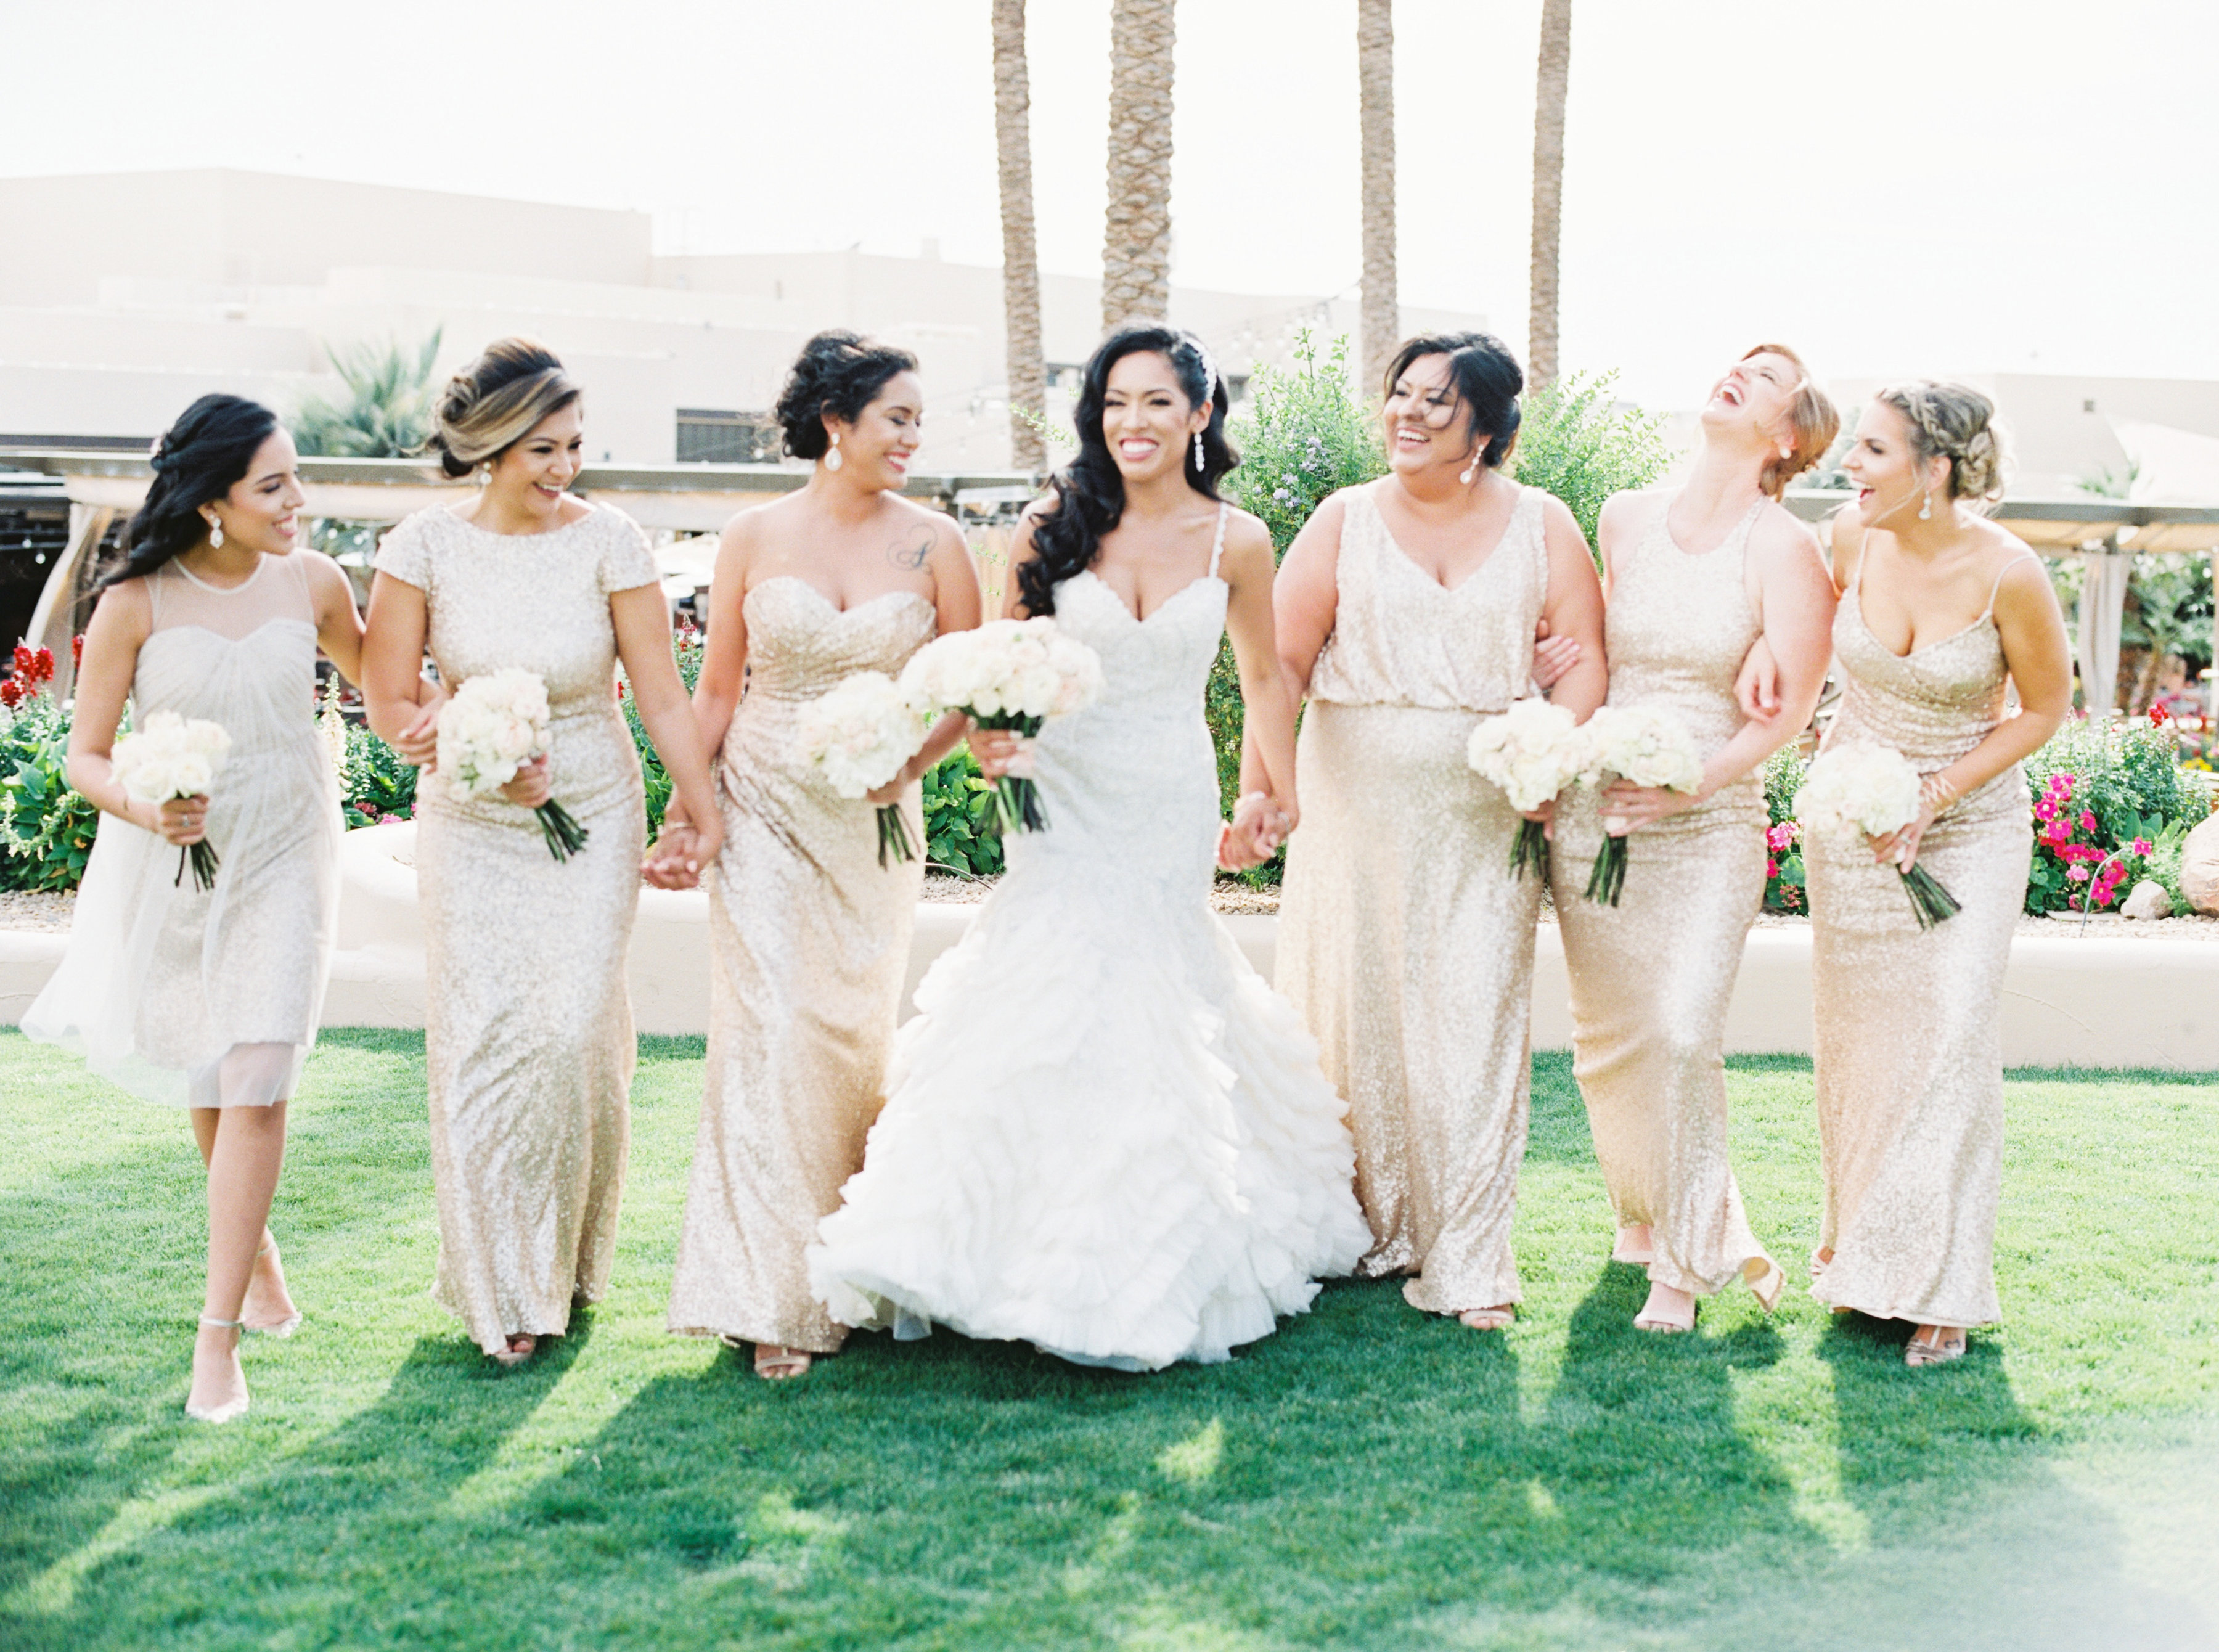 Stunning White Wedding - Your Jubilee Weddings & Events